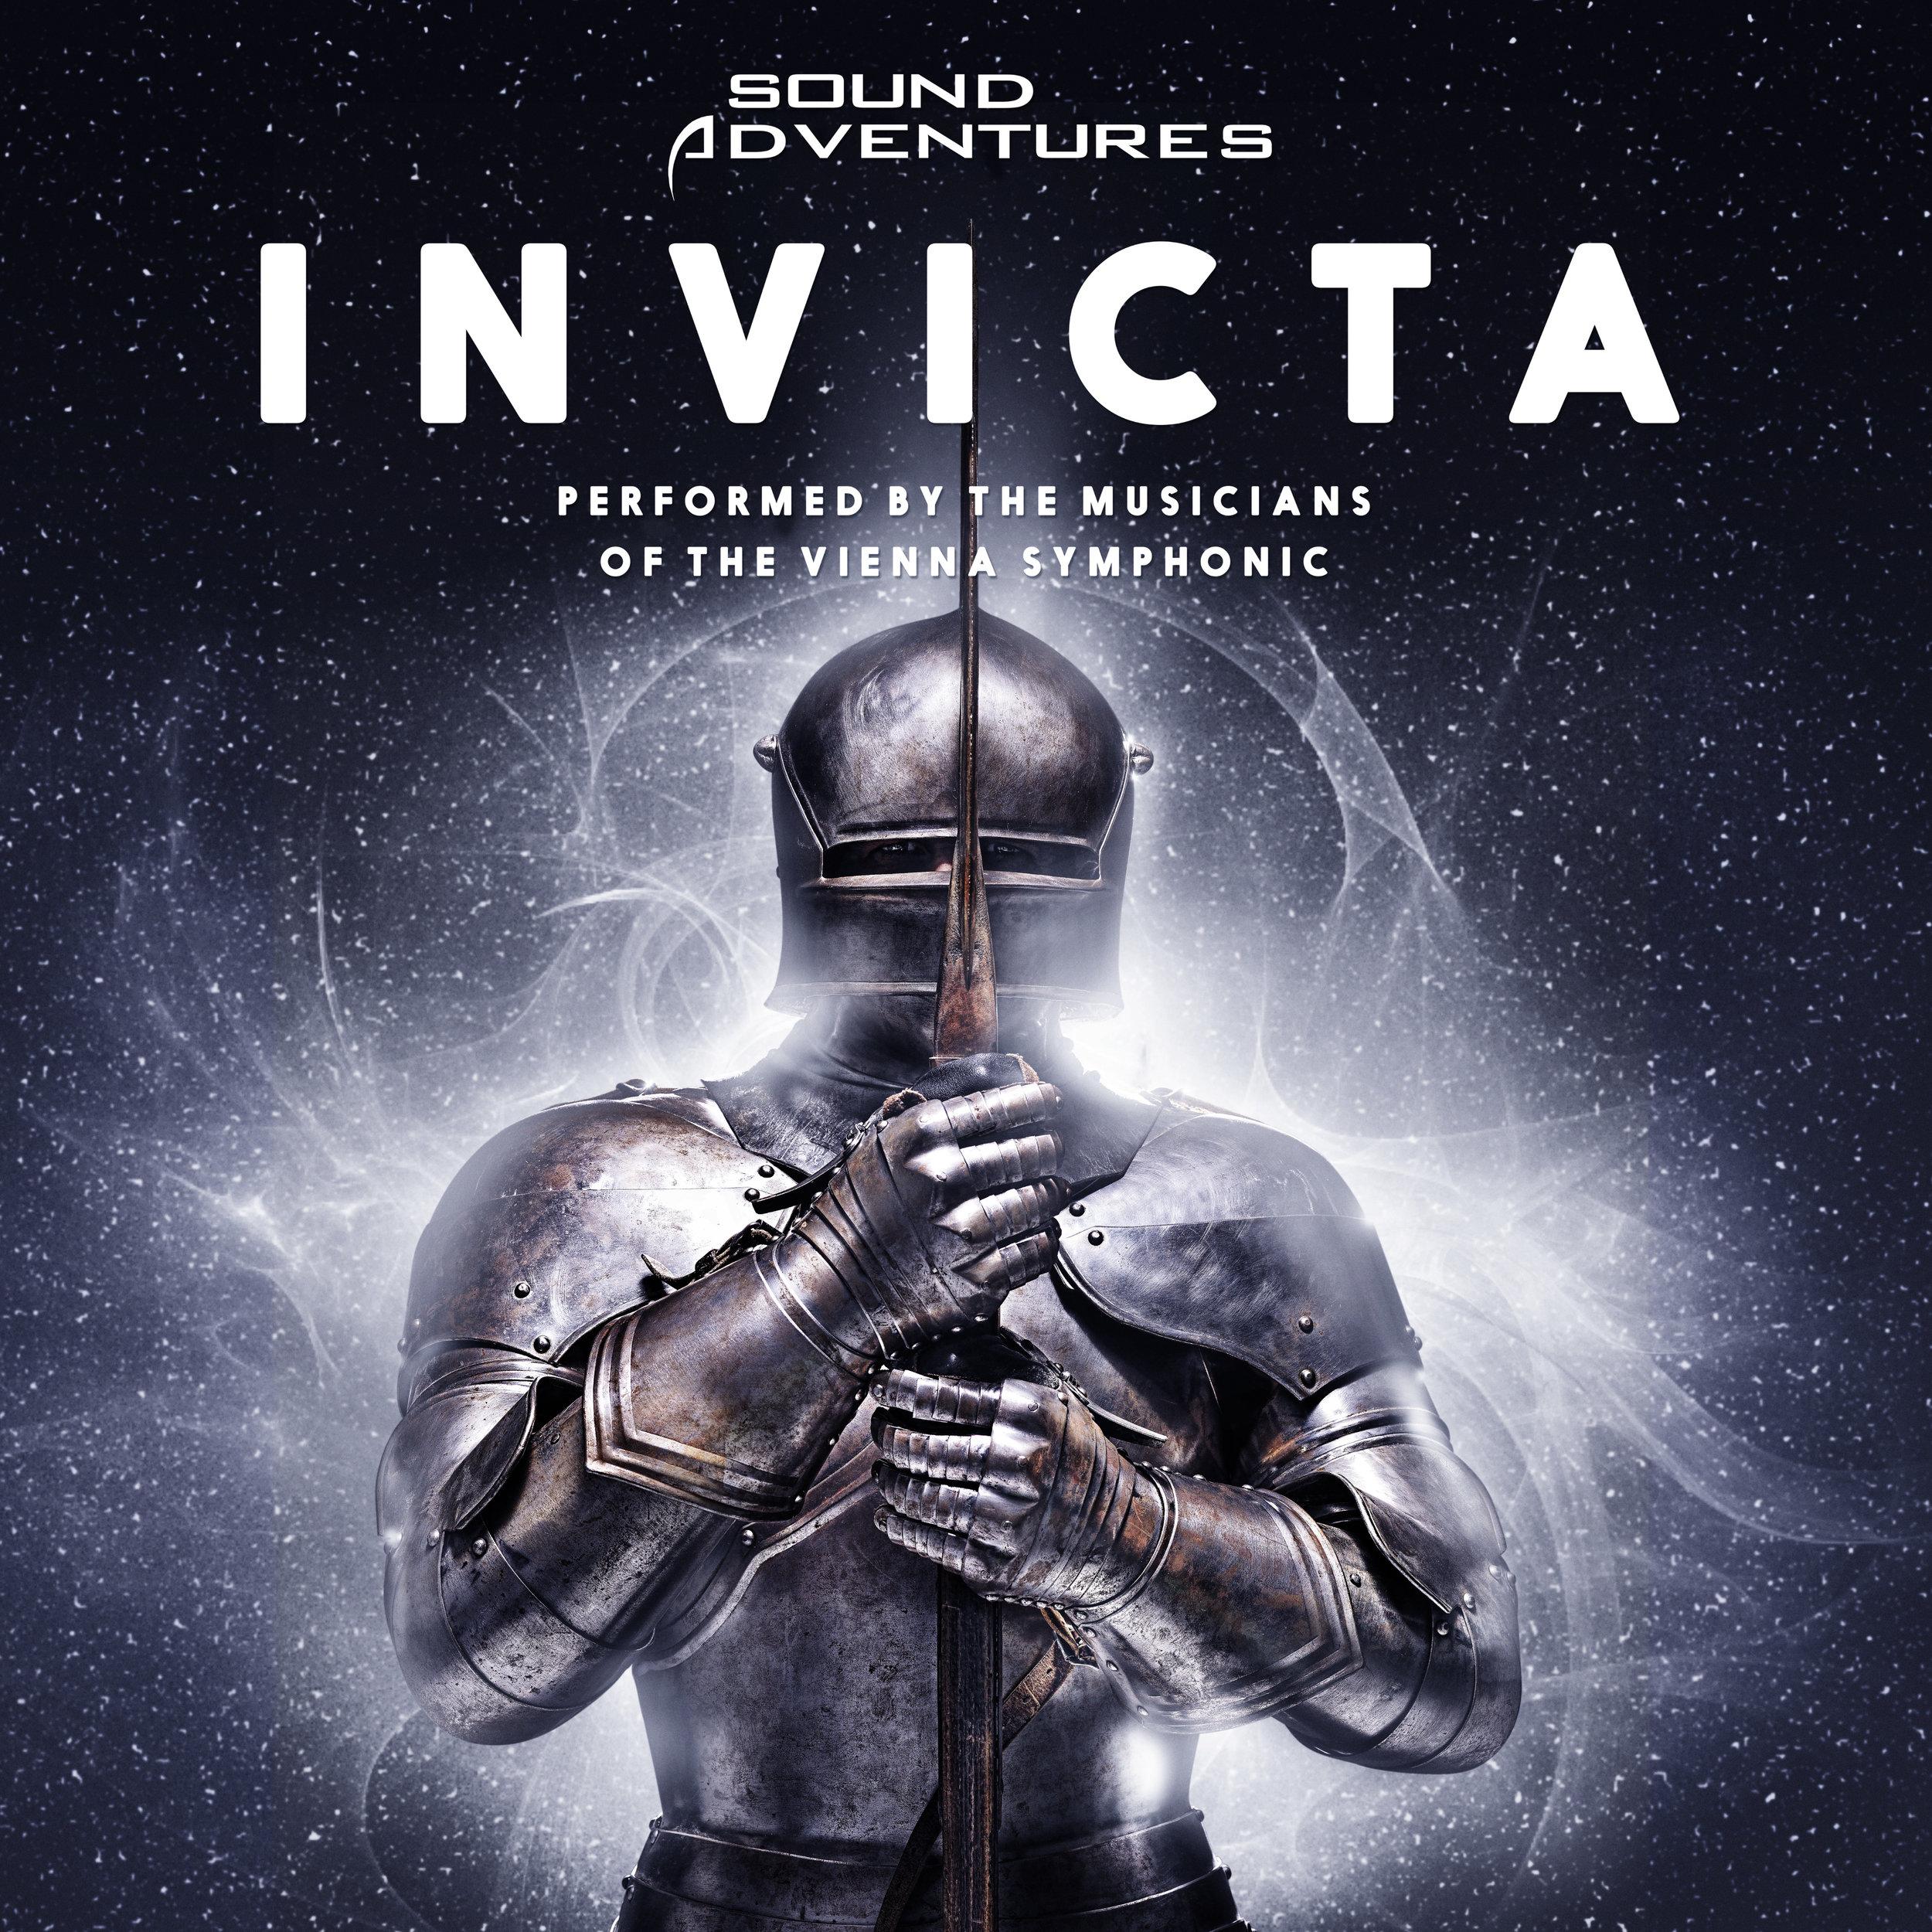 SoundAdventures_INVICTA_.jpg